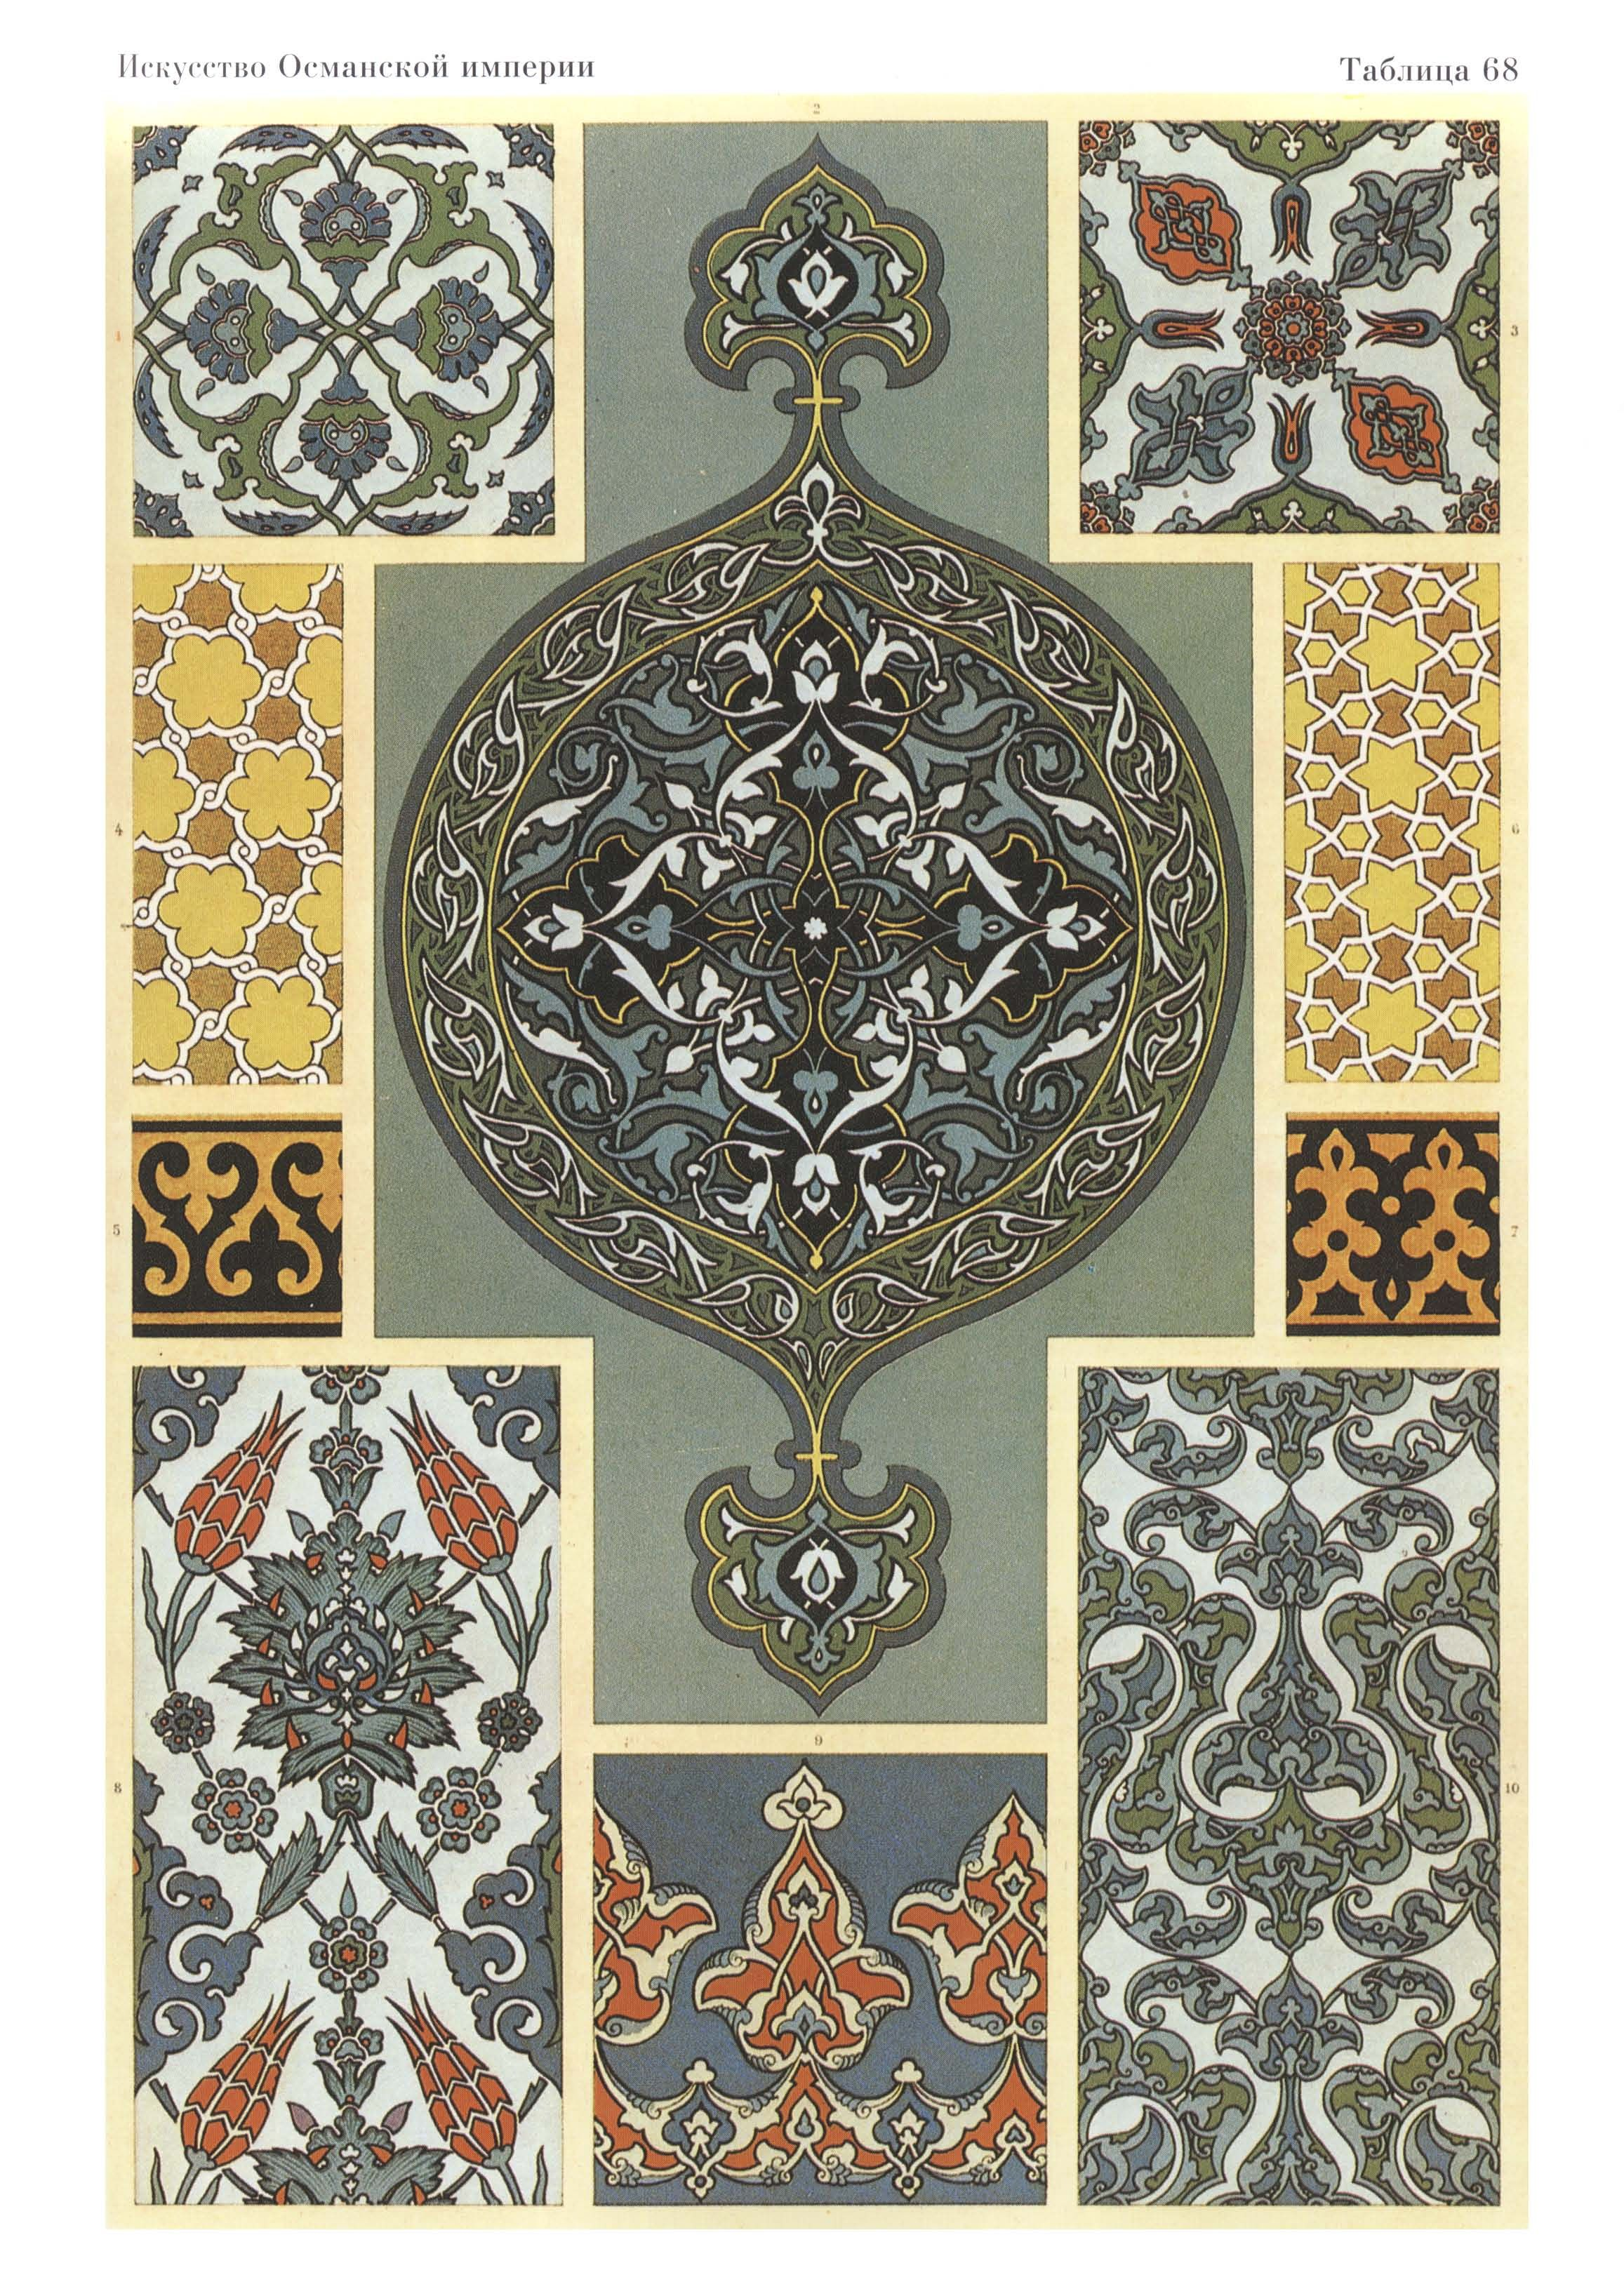 Pattern Ideas, Patterns, Ornament, Art Prints, Deviantart, Fabric, Ottomans, Tejido,